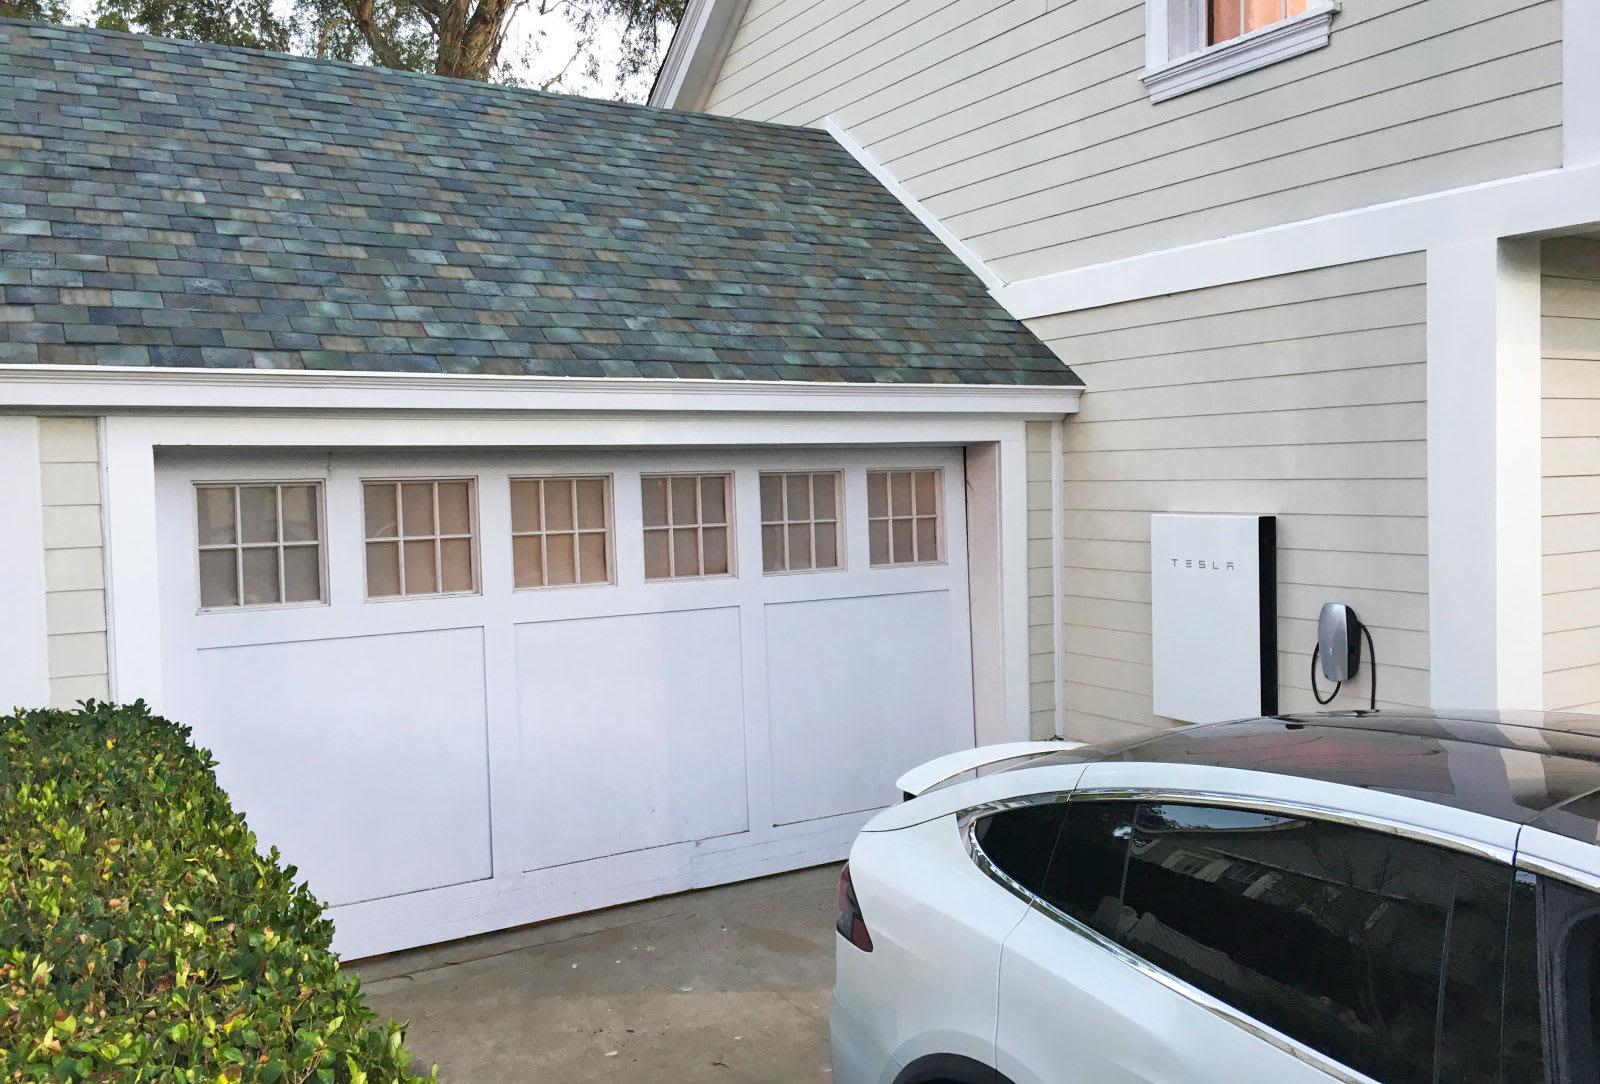 Tesla Roof Shingles >> Tesla Patent Application Explains How Its Solar Roof Tiles Work